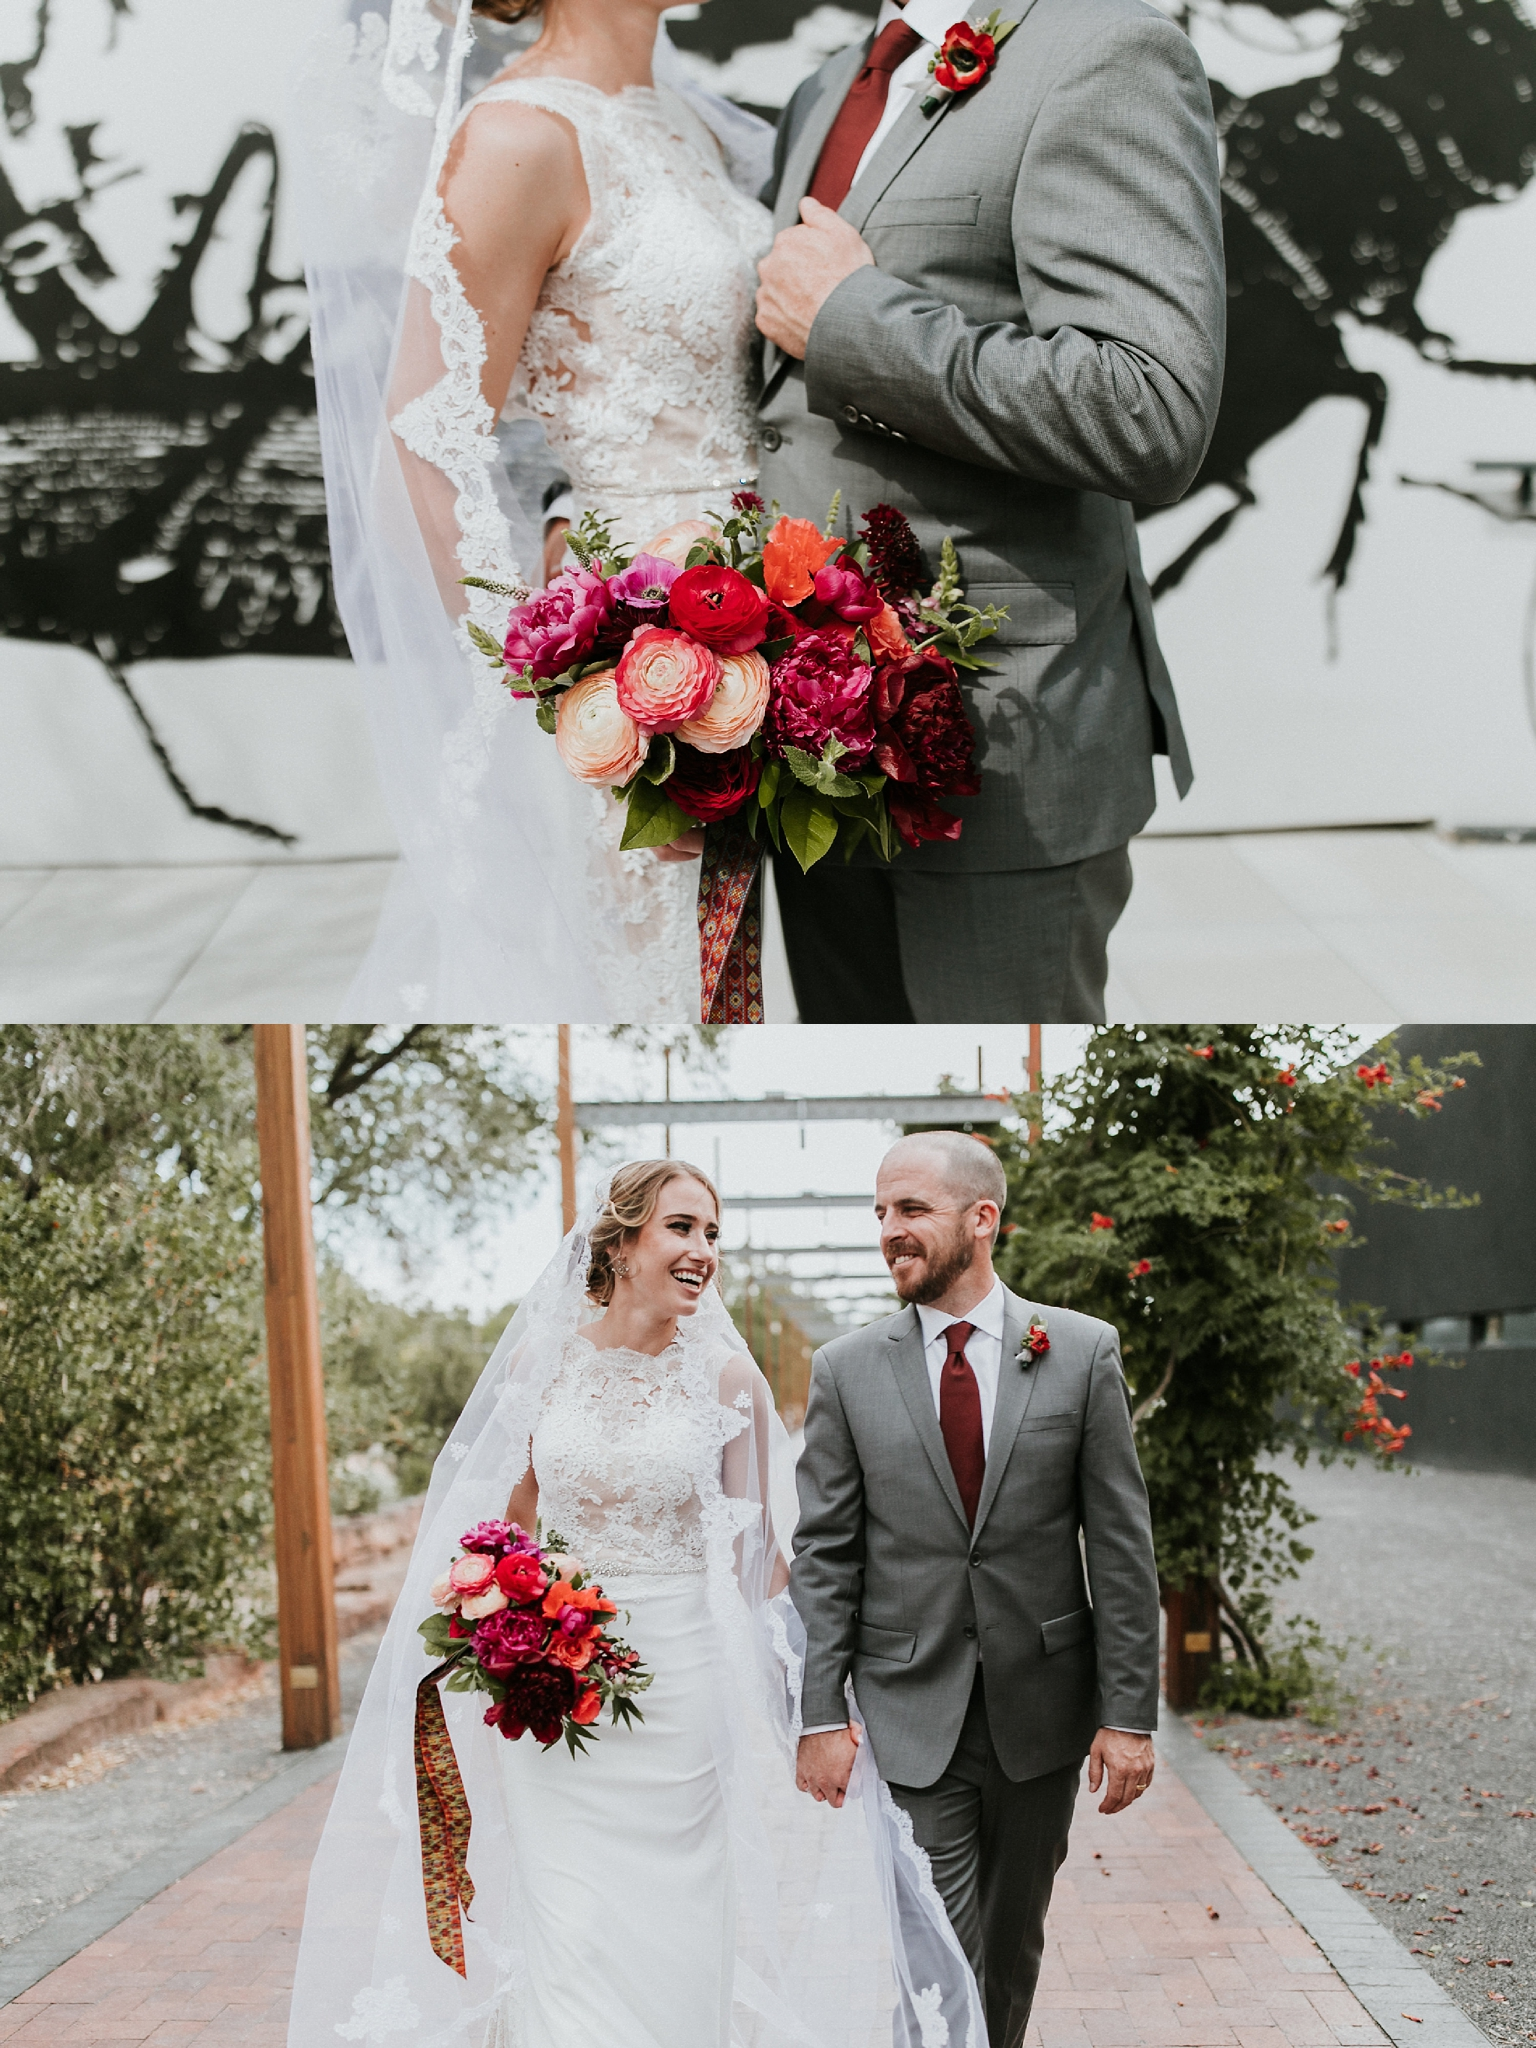 Alicia+lucia+photography+-+albuquerque+wedding+photographer+-+santa+fe+wedding+photography+-+new+mexico+wedding+photographer+-+new+mexico+wedding+-+wedding+-+groom+-+groom+style+-+wedding+style_0058.jpg